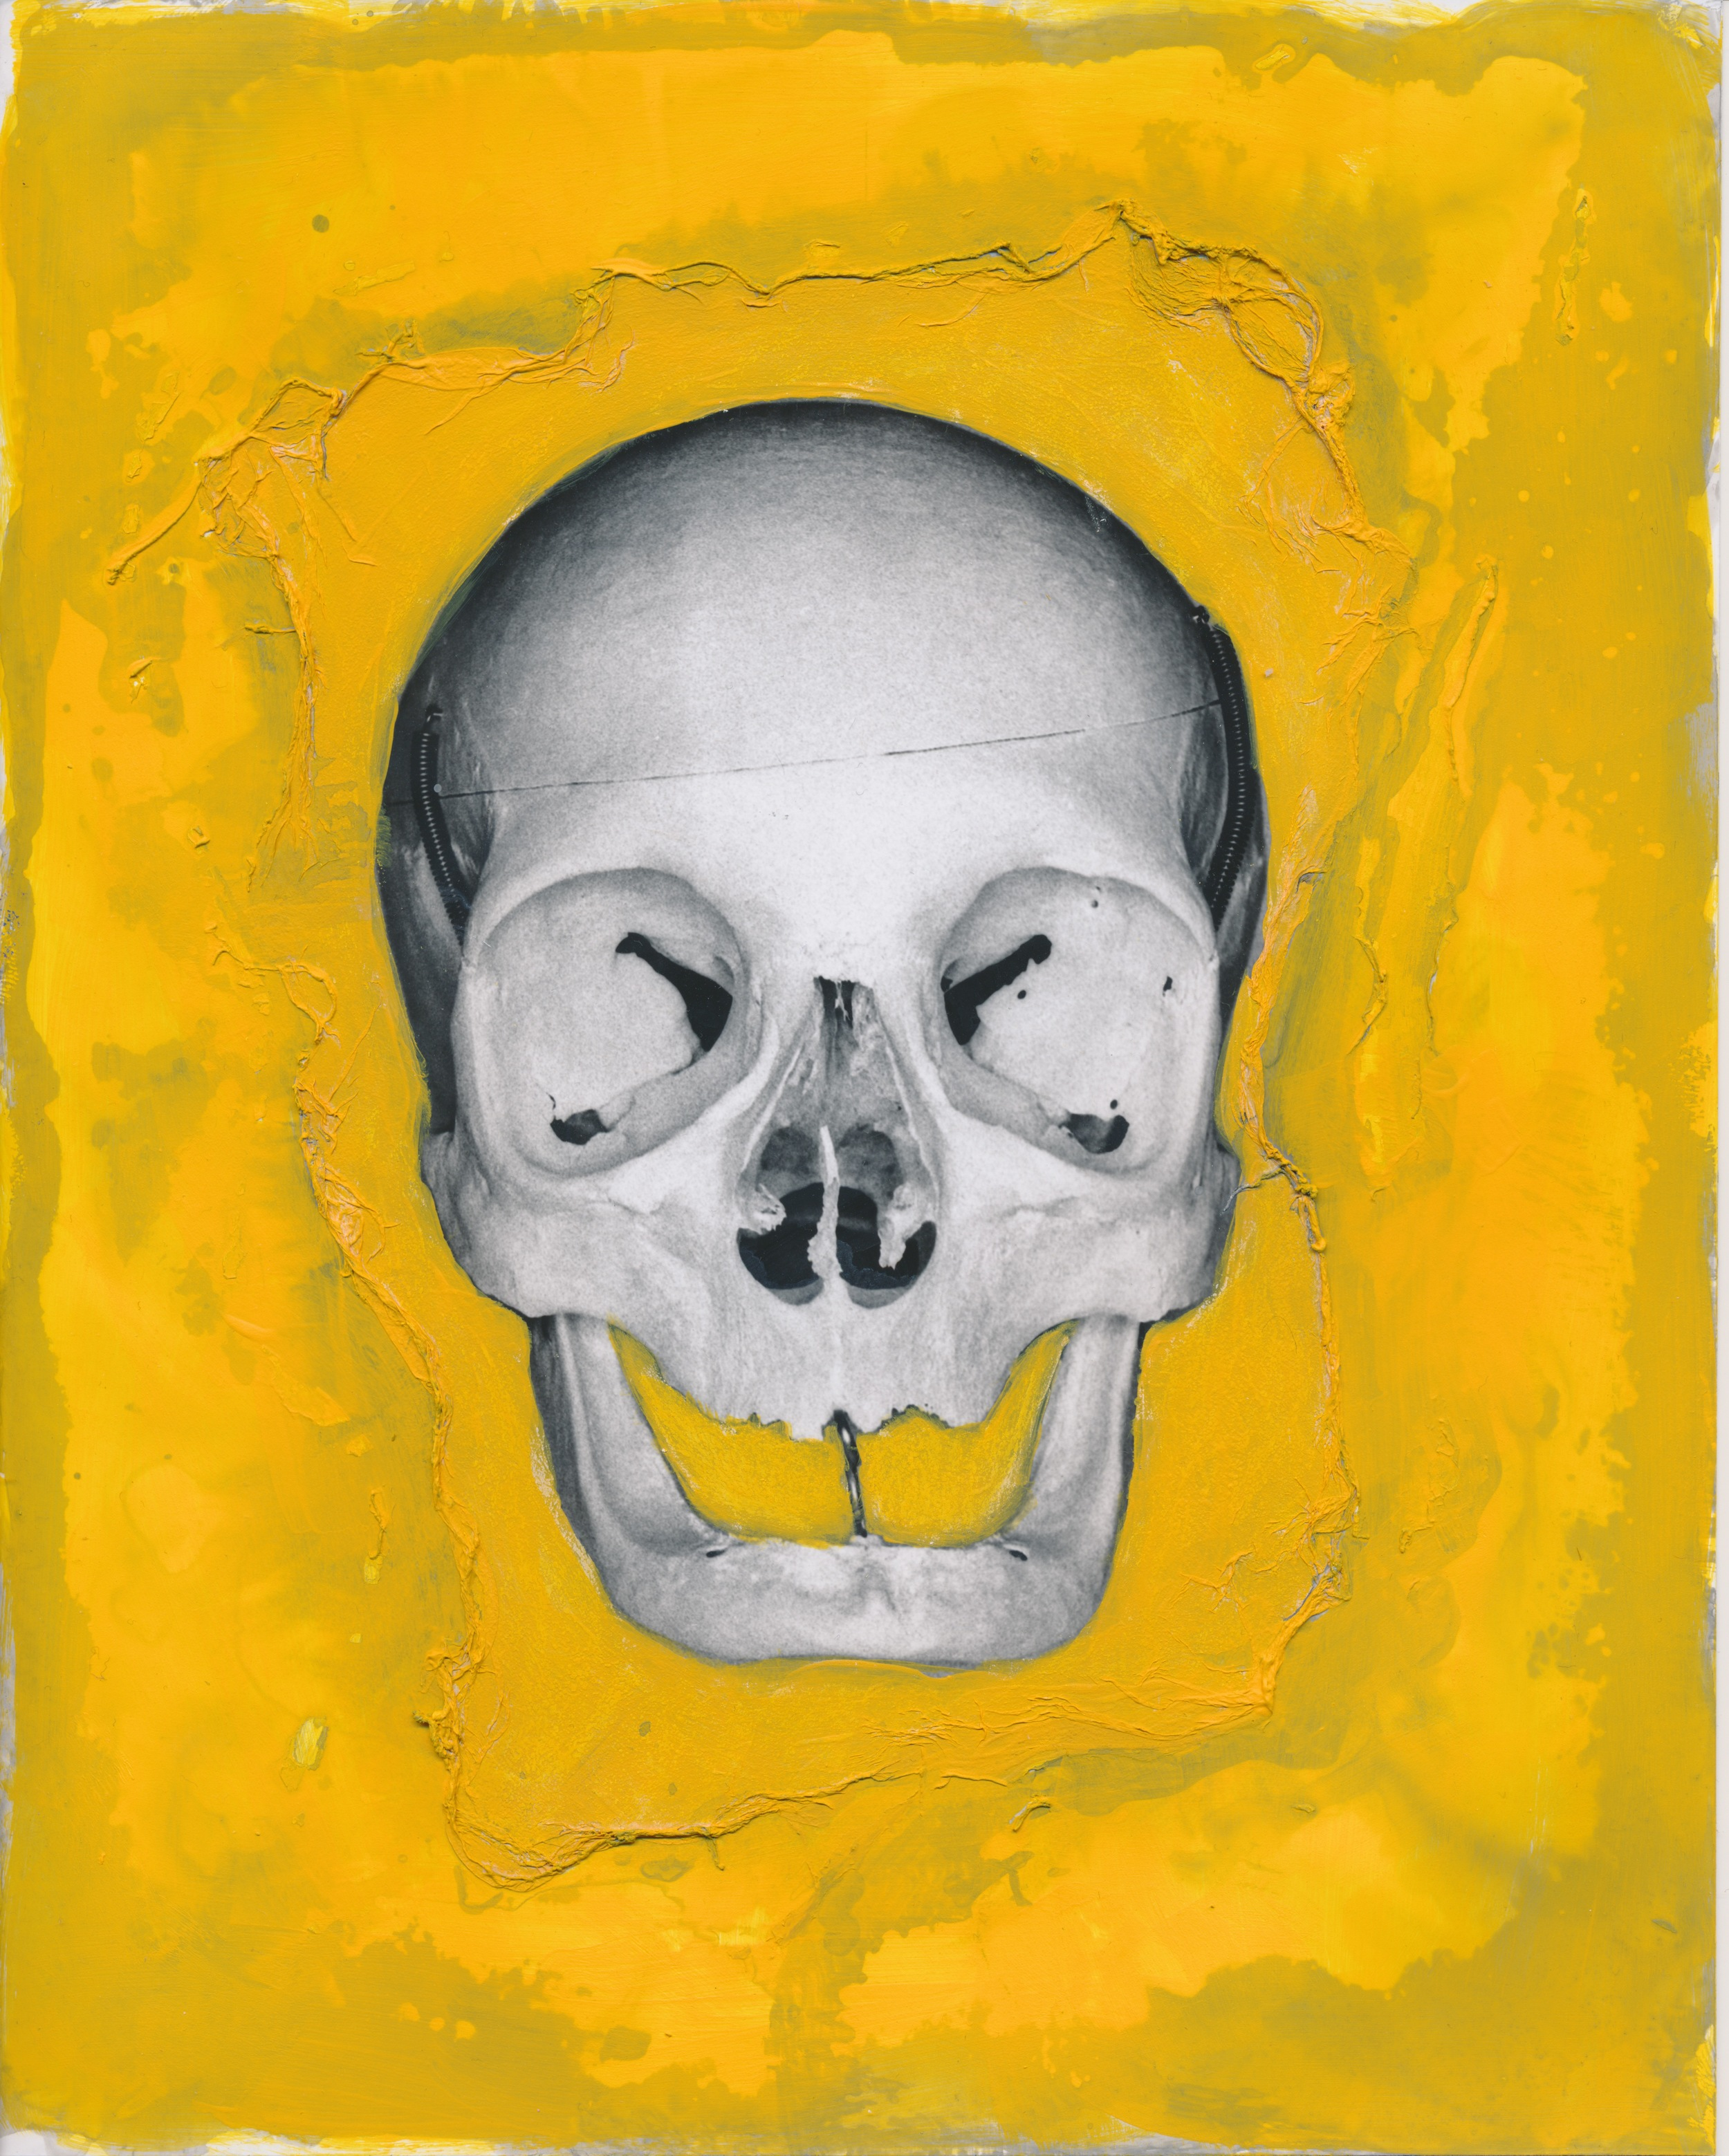 Homo sapien   2015  Acrylic on gelatin silver print  8x10